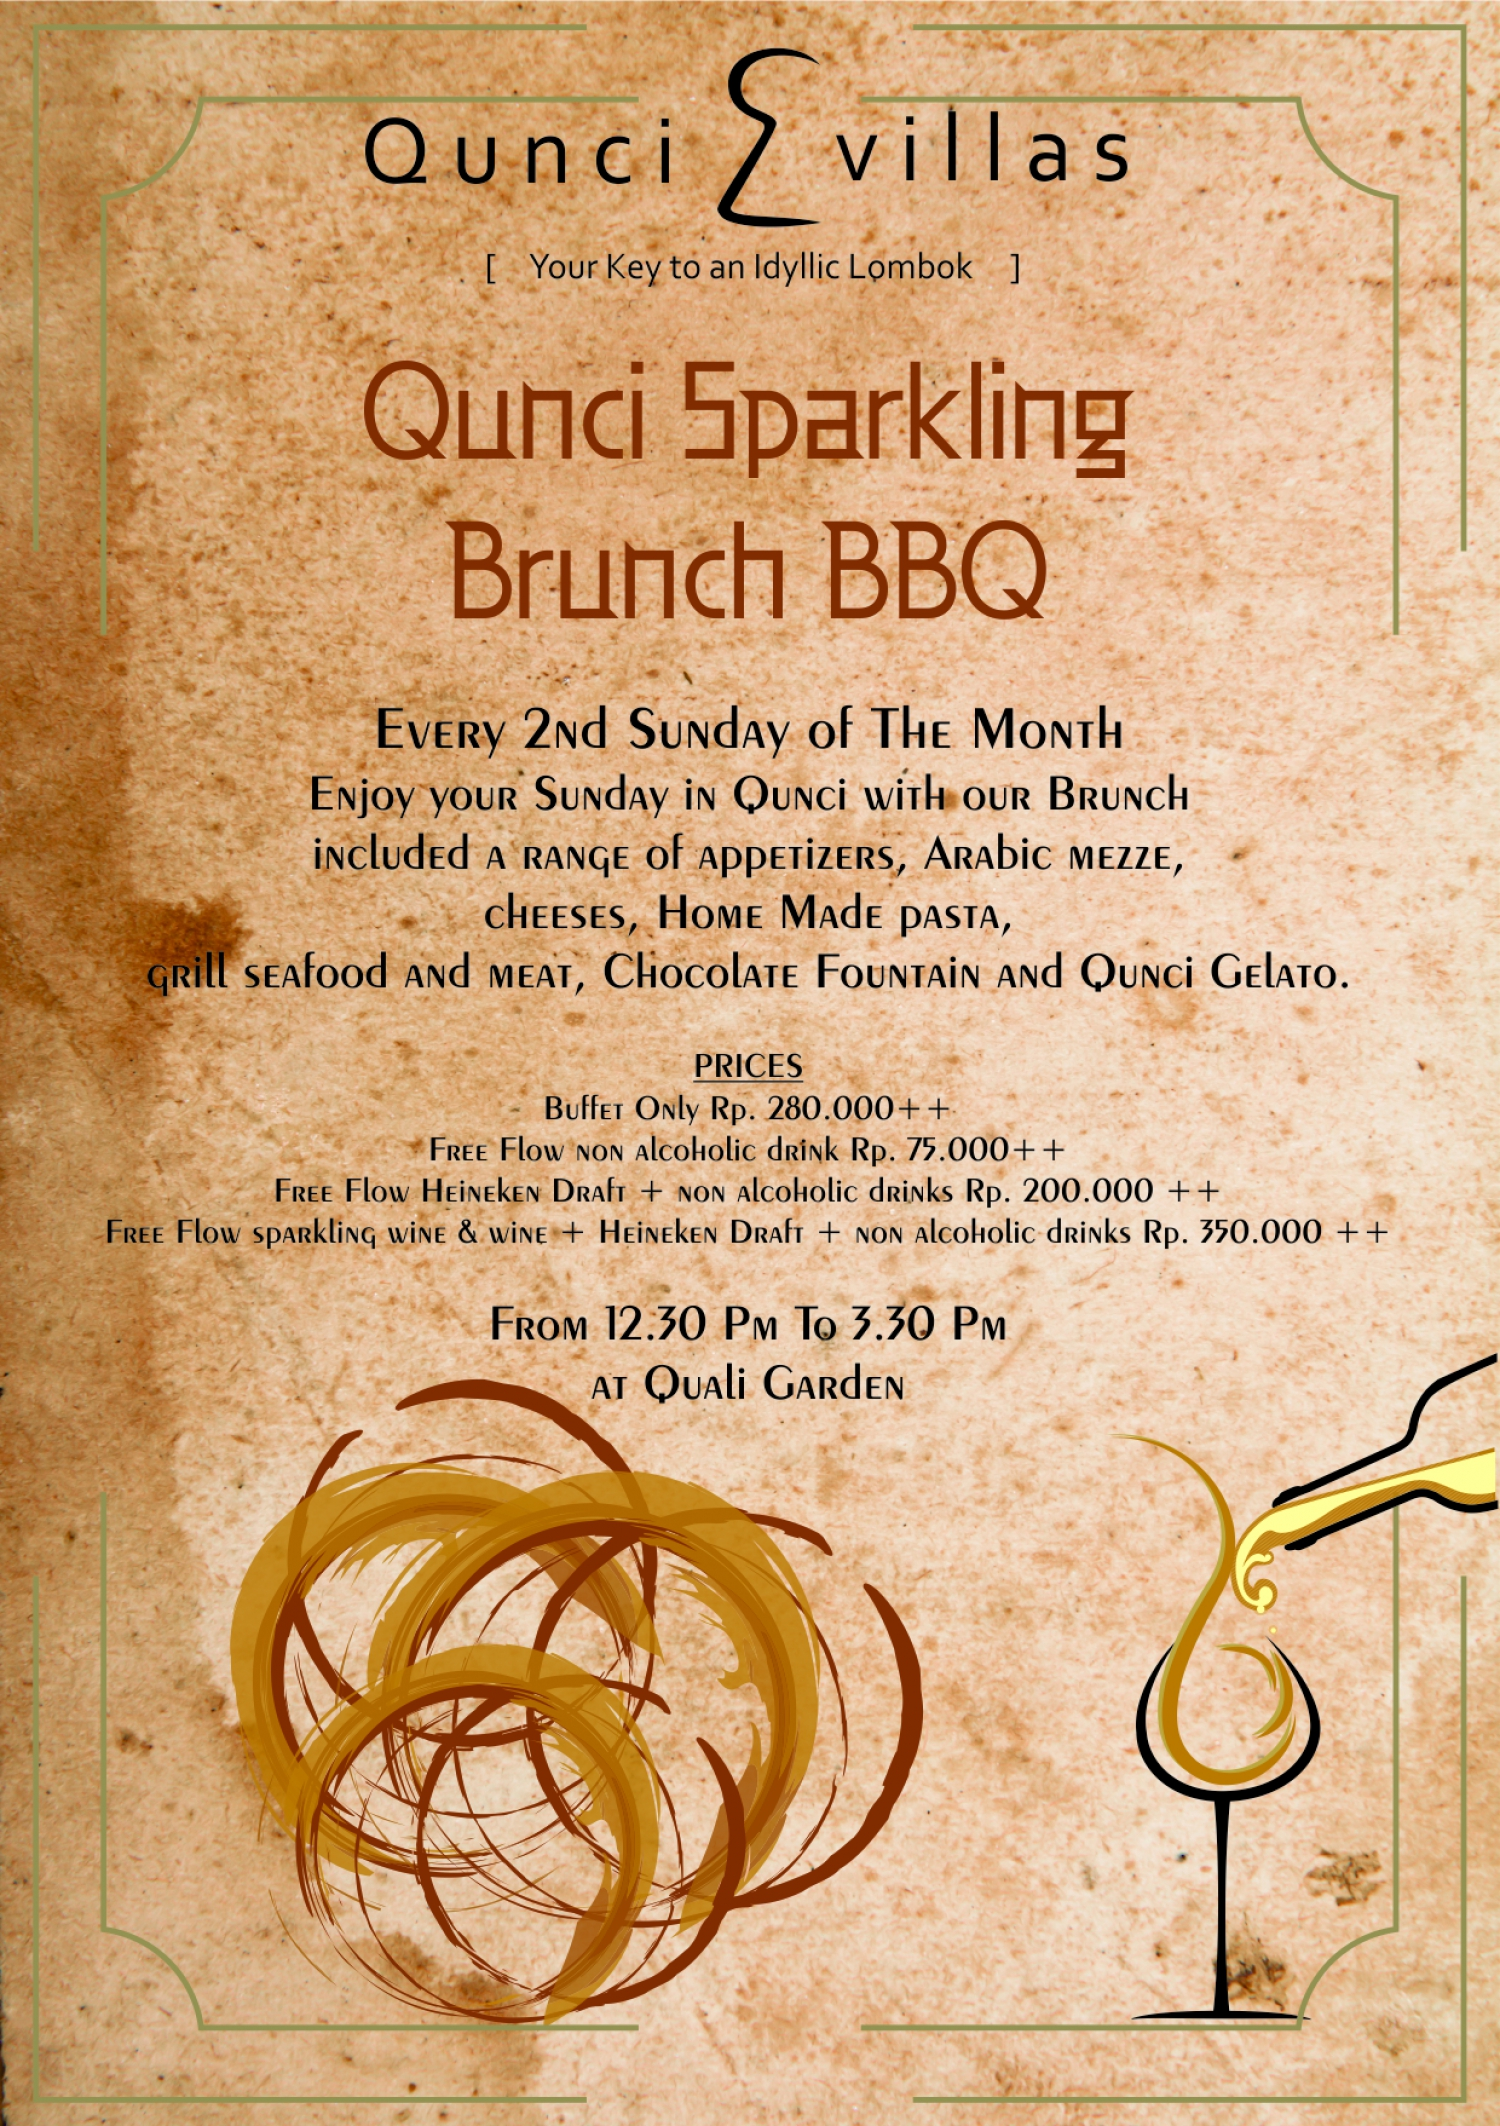 Qunci Sparkling Brunch BBQ